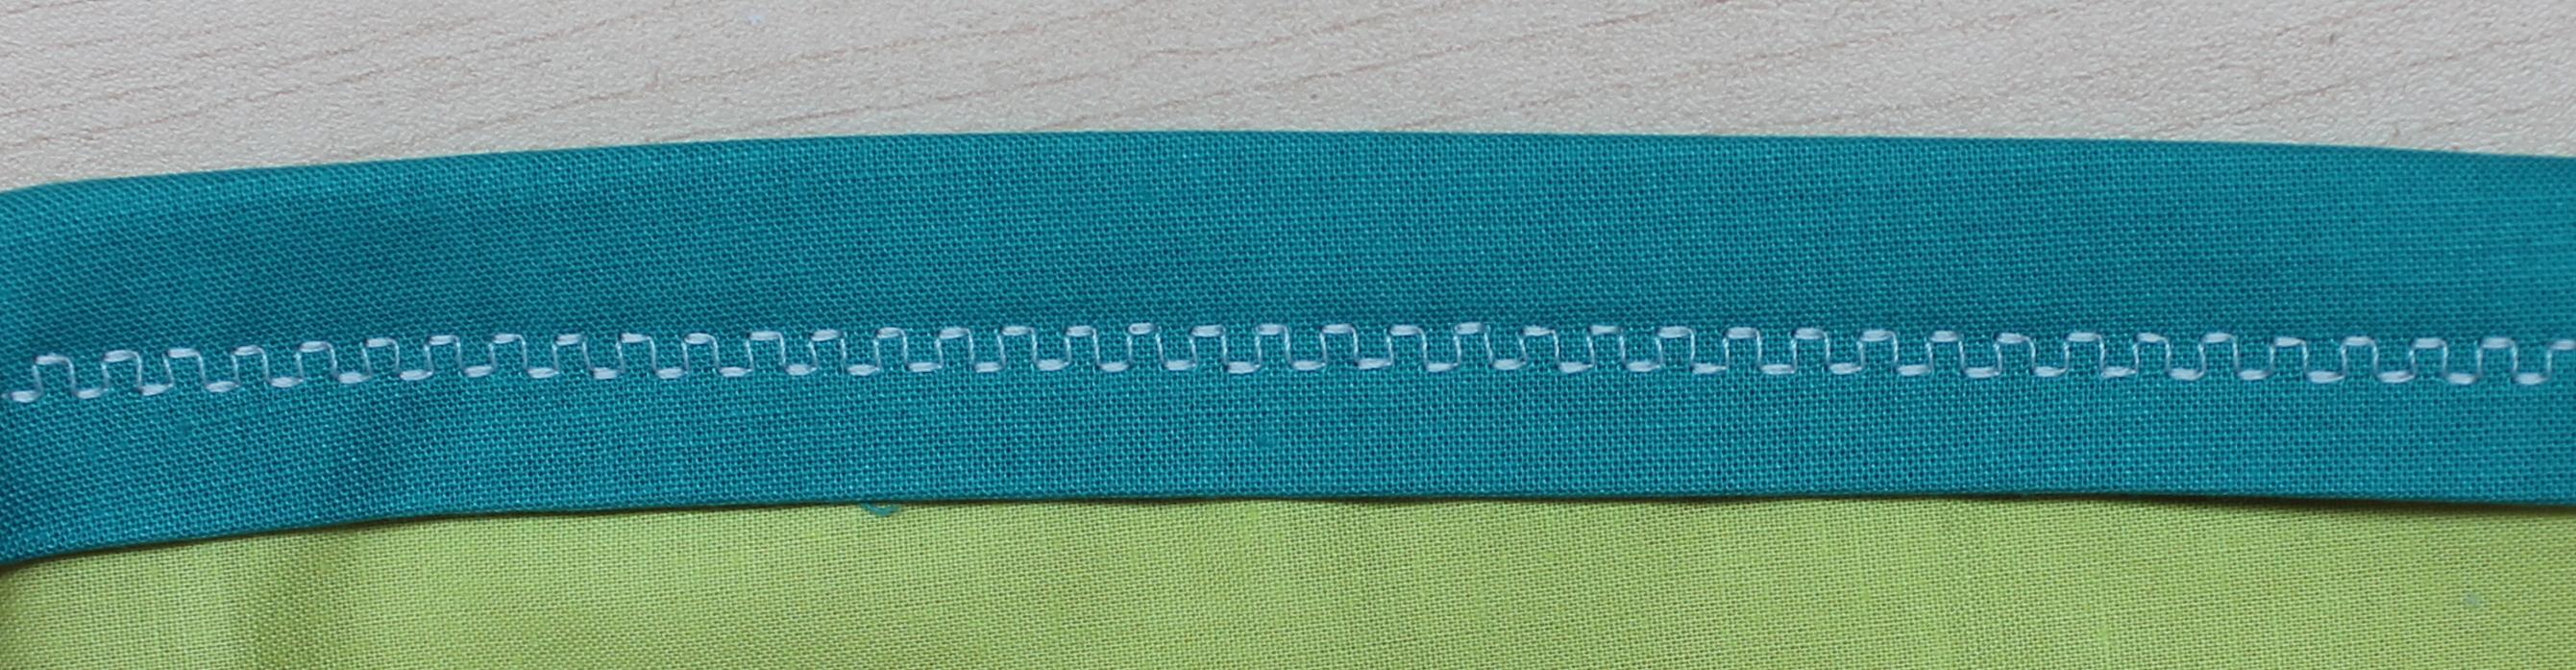 Decorative stitch on binding